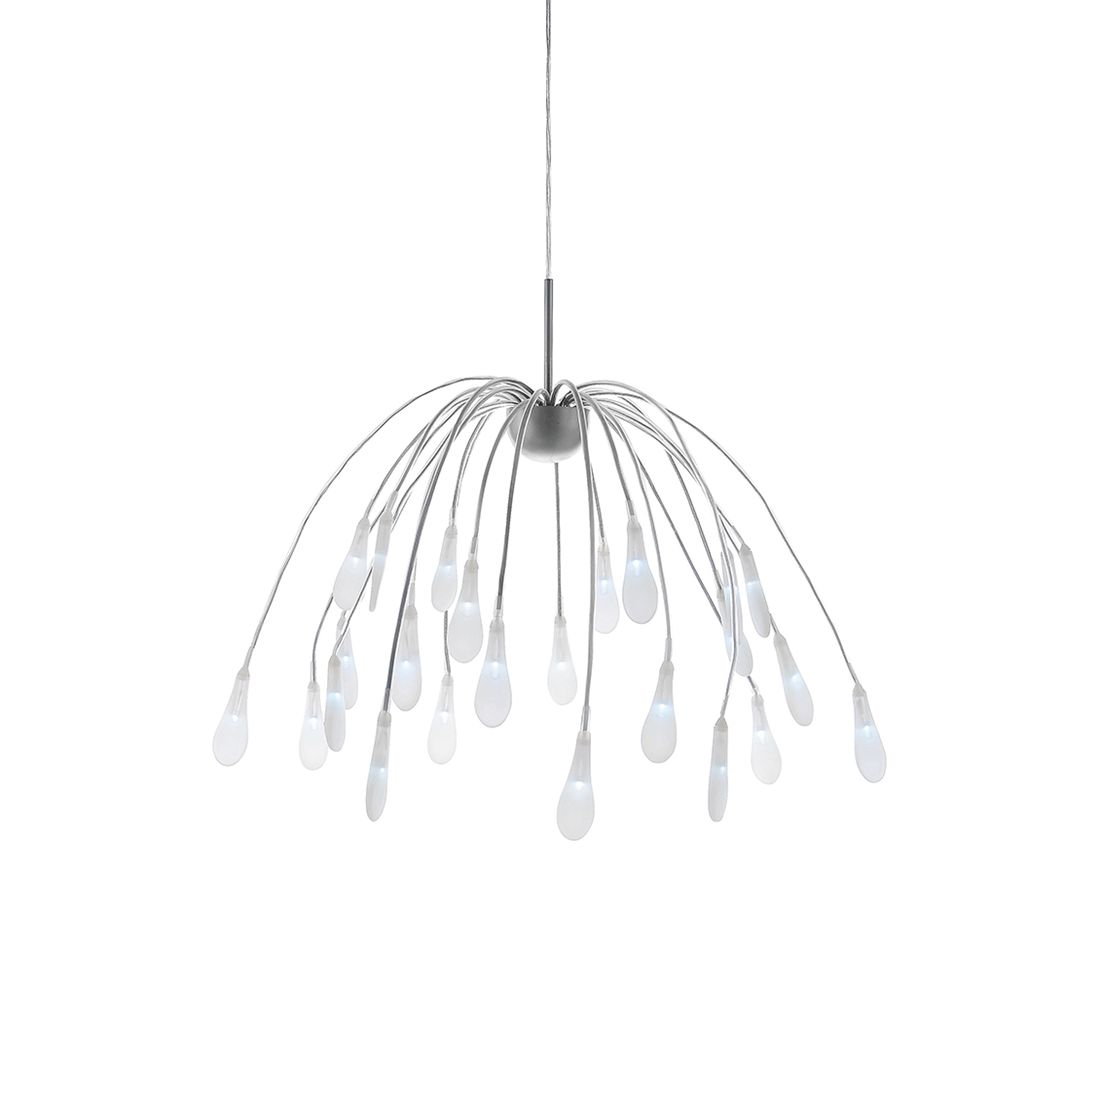 LED-Pendelleuchte Akuma by Leuchten Direkt ● Eisen/Kunststoff ● Silber- Leuchten Direkt A+